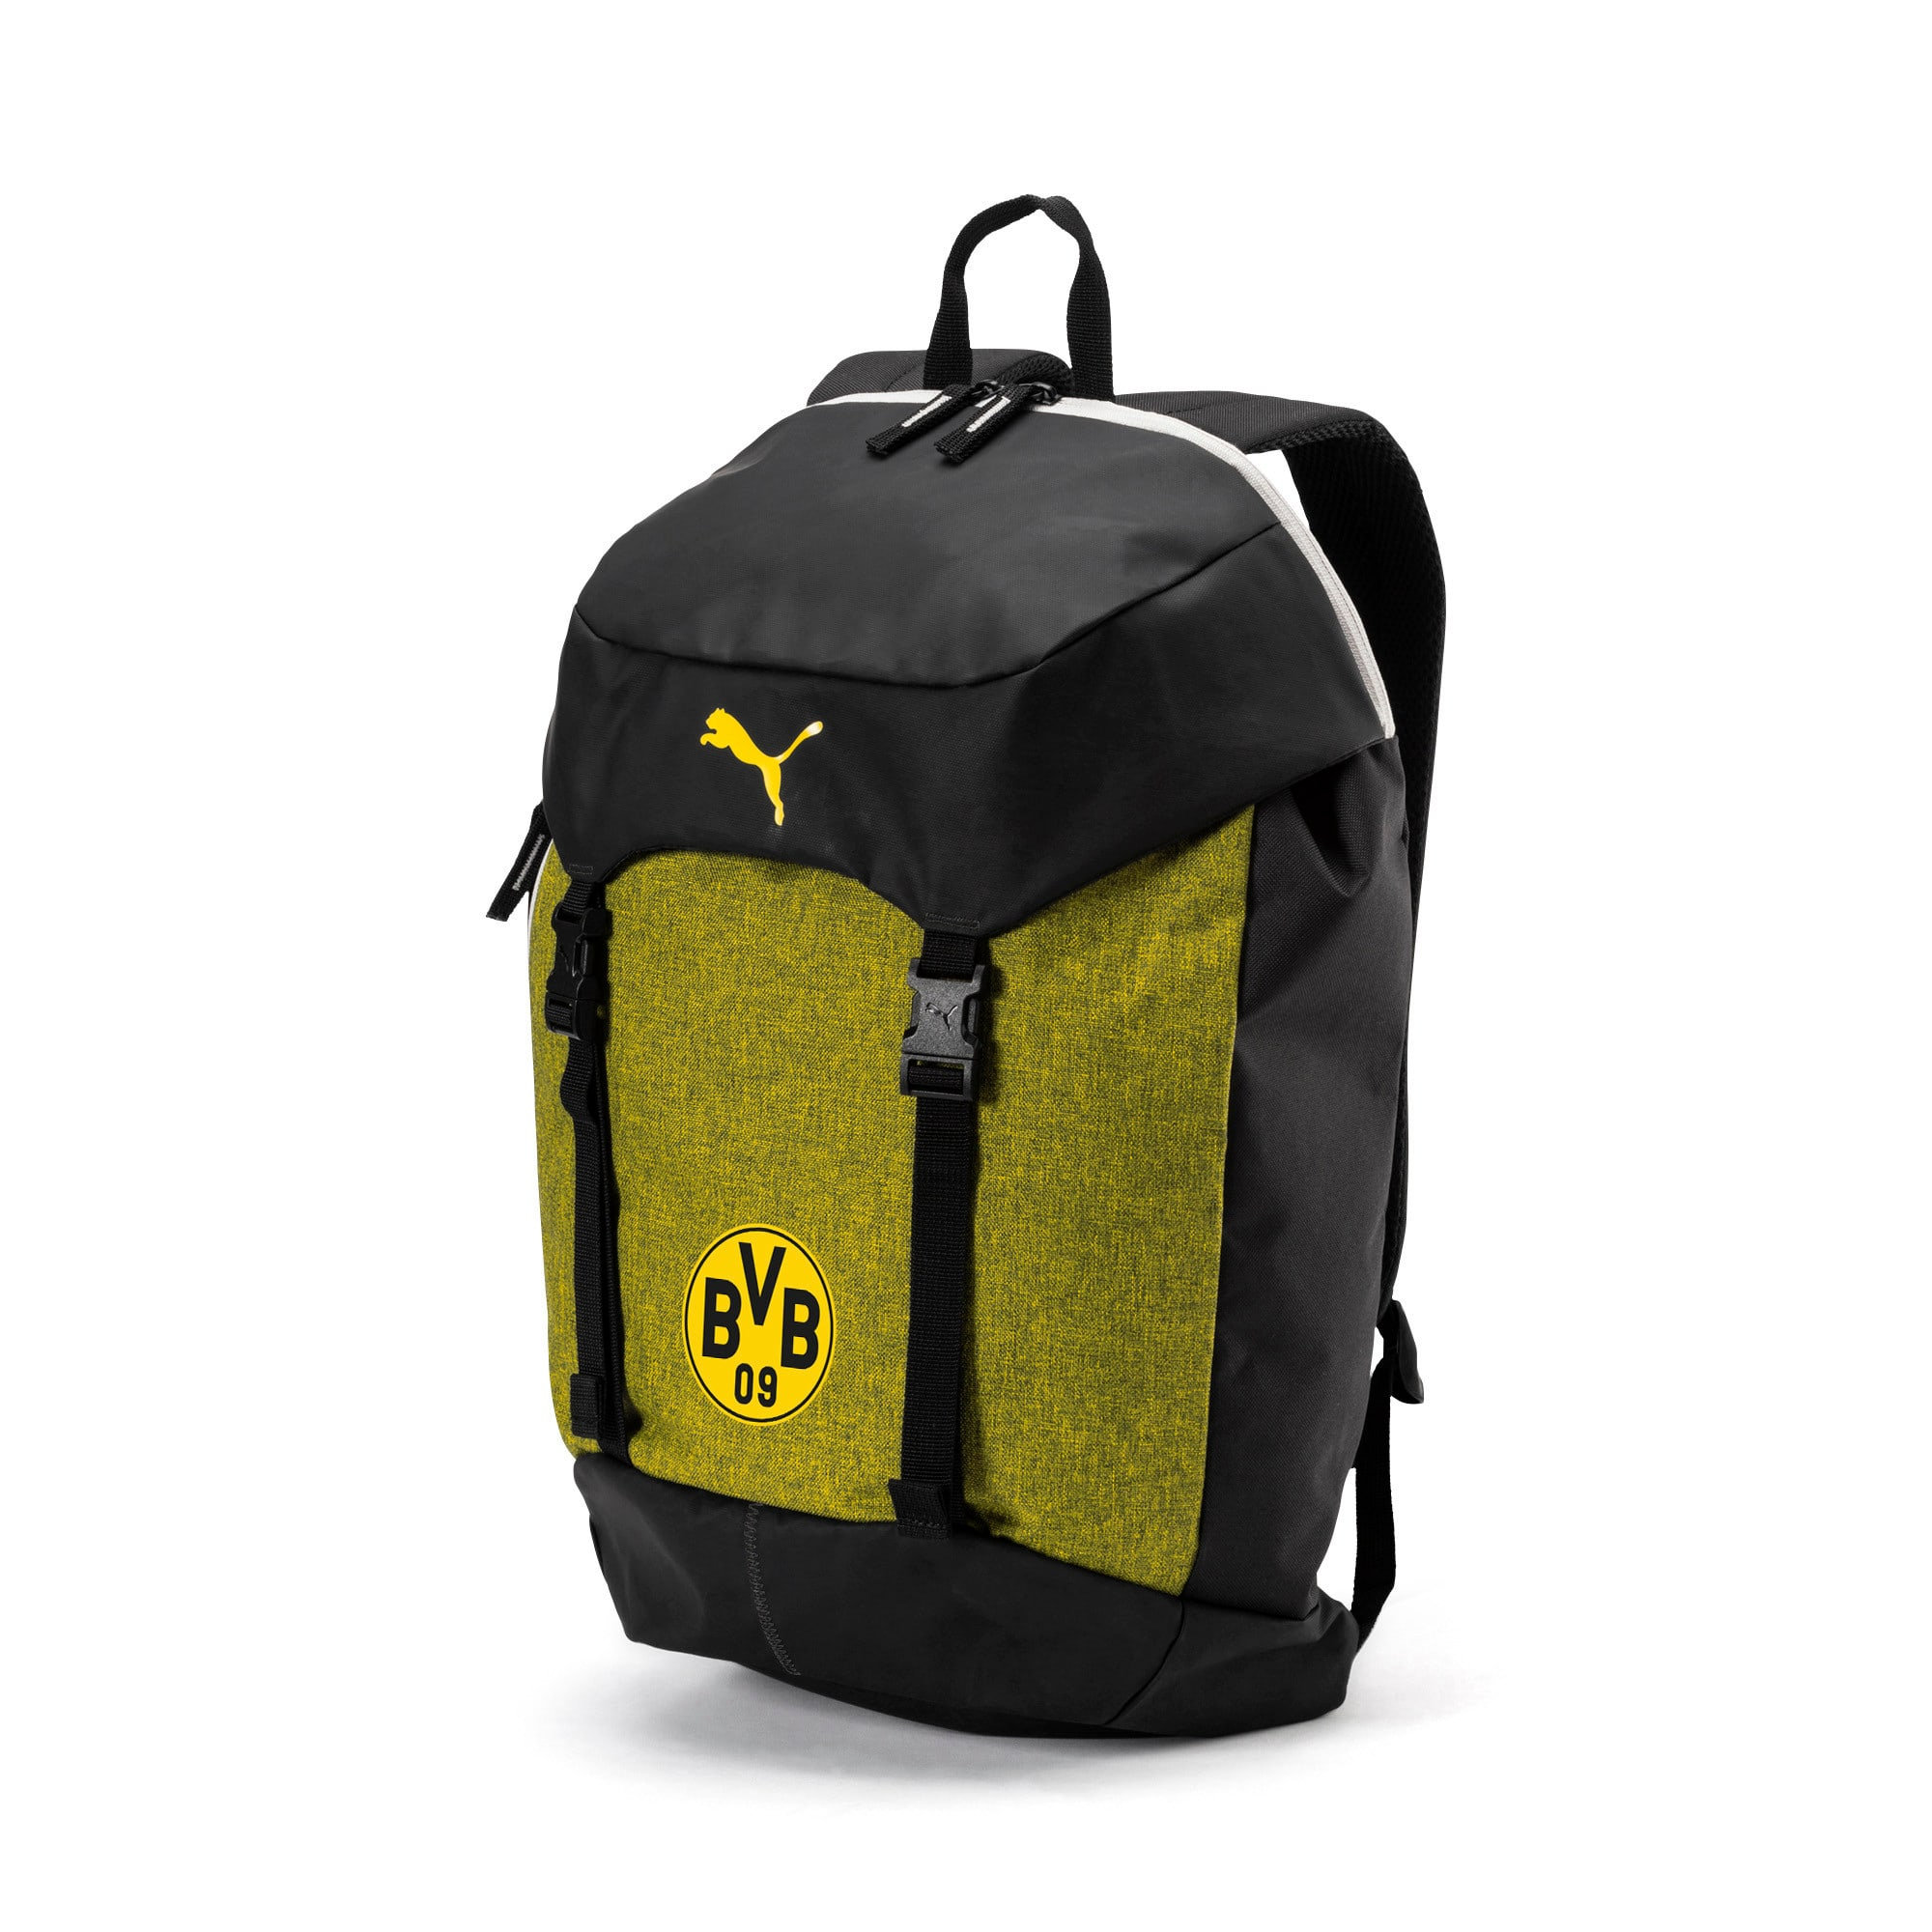 Thumbnail 1 of BVB 365 Backpack, Puma Black-Cyber Yellow, medium-IND